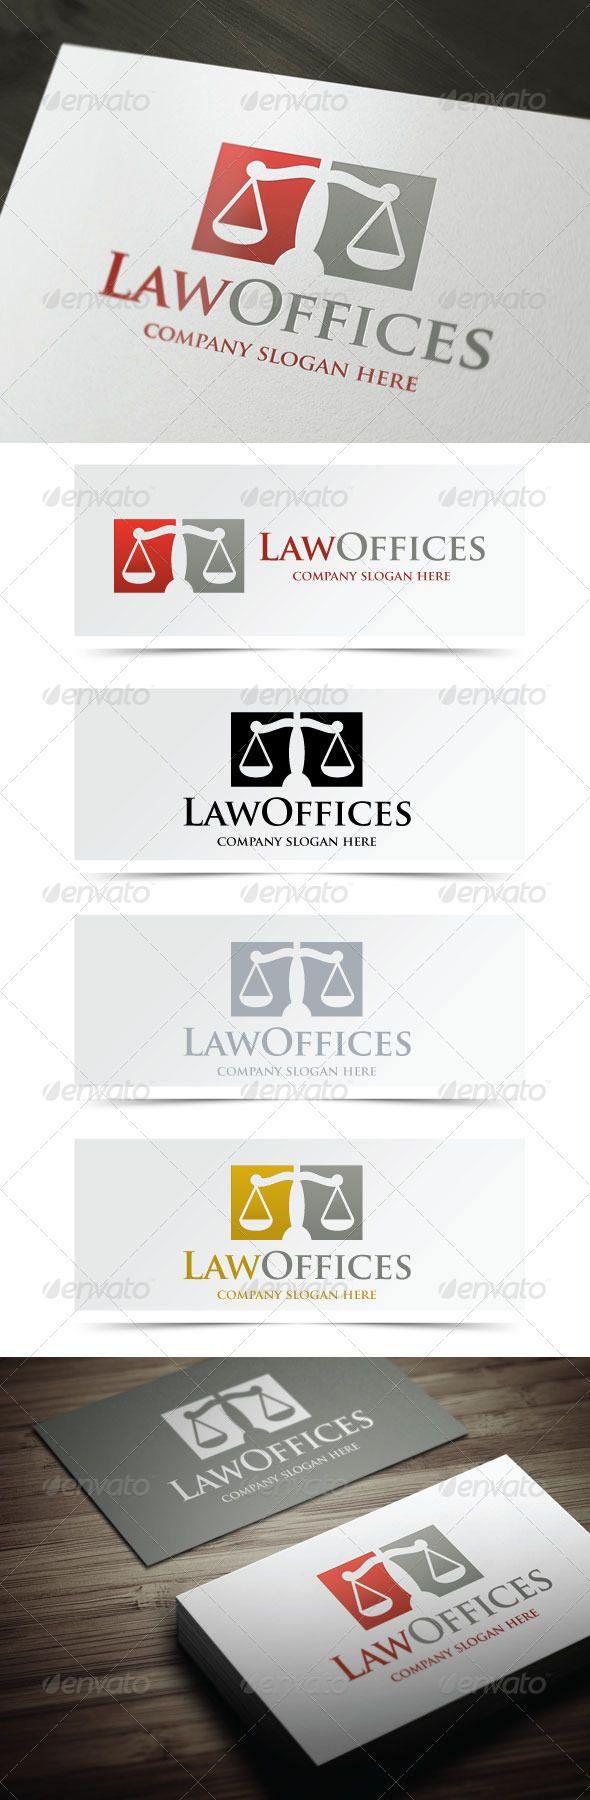 Law Offices http://graphicriver.net/user/debo243/portfolio